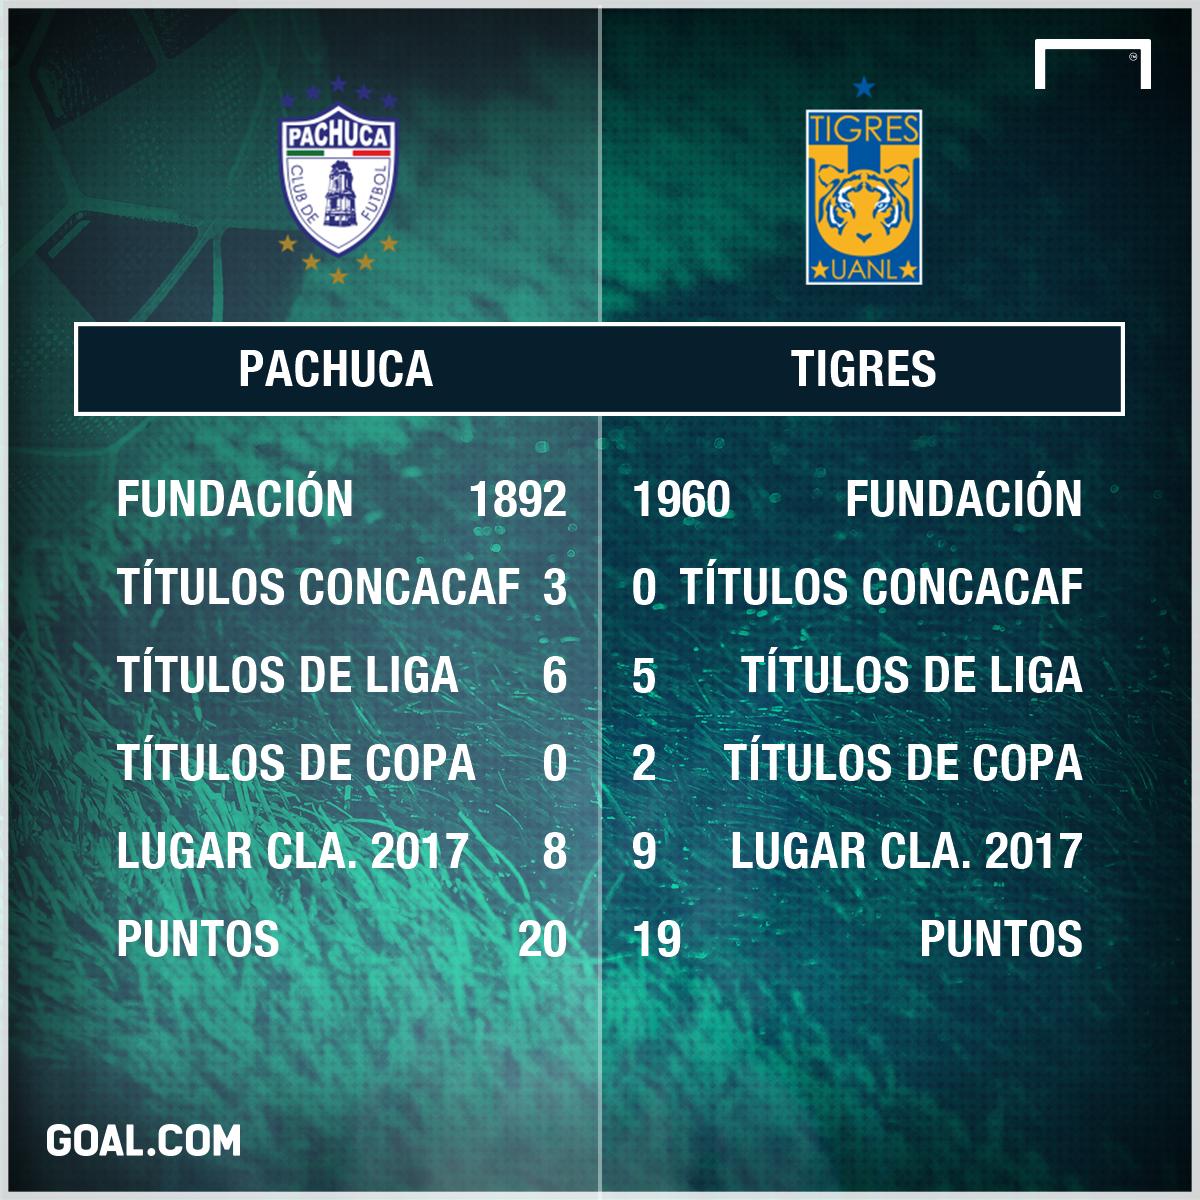 Pachuca-Tigres